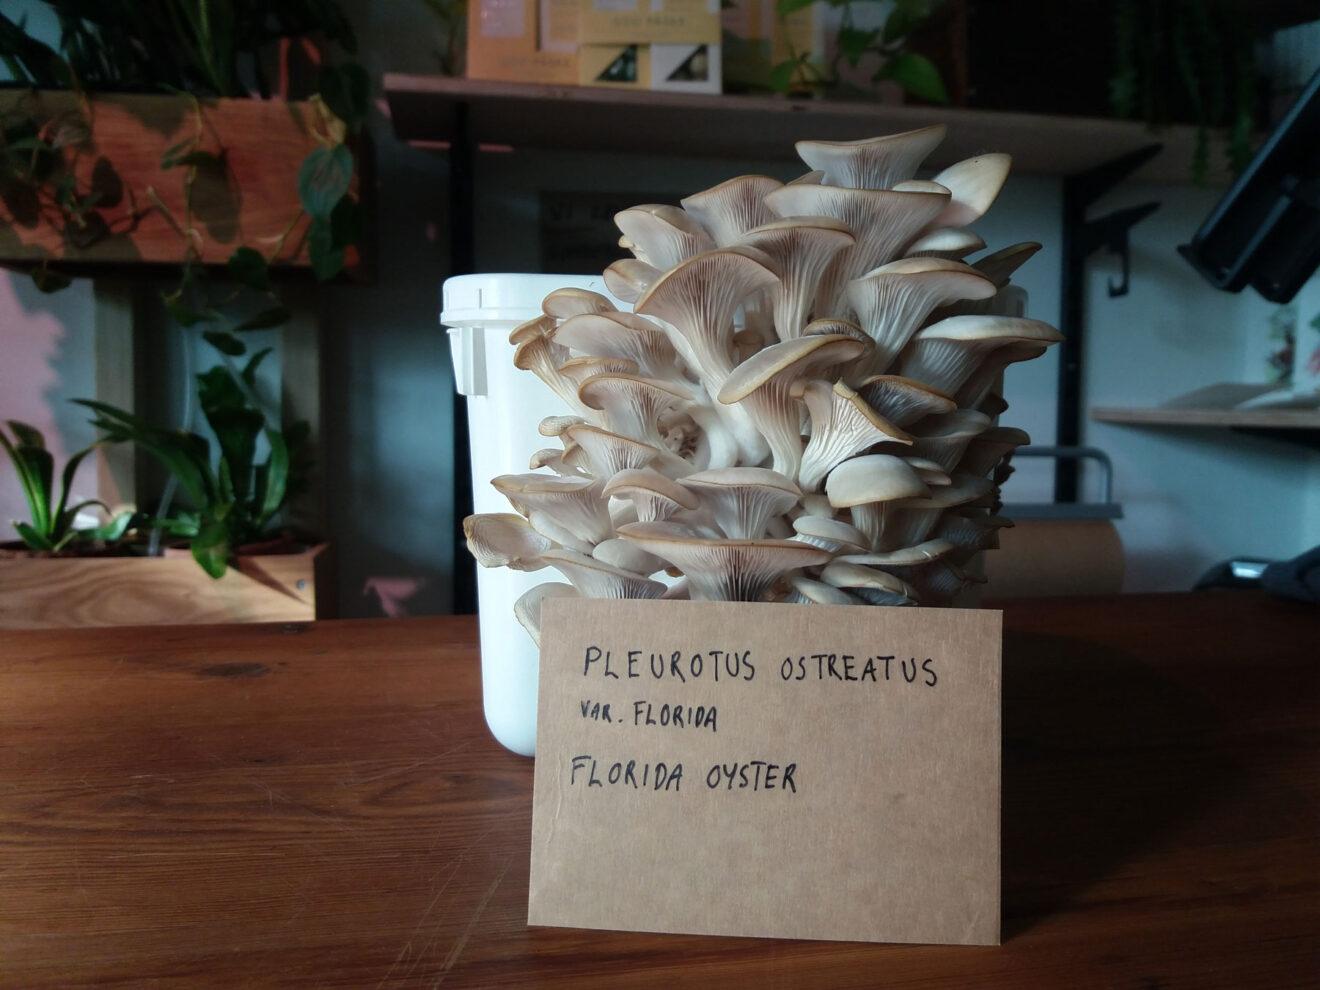 Mycelium - 100g - Floridaøstershat